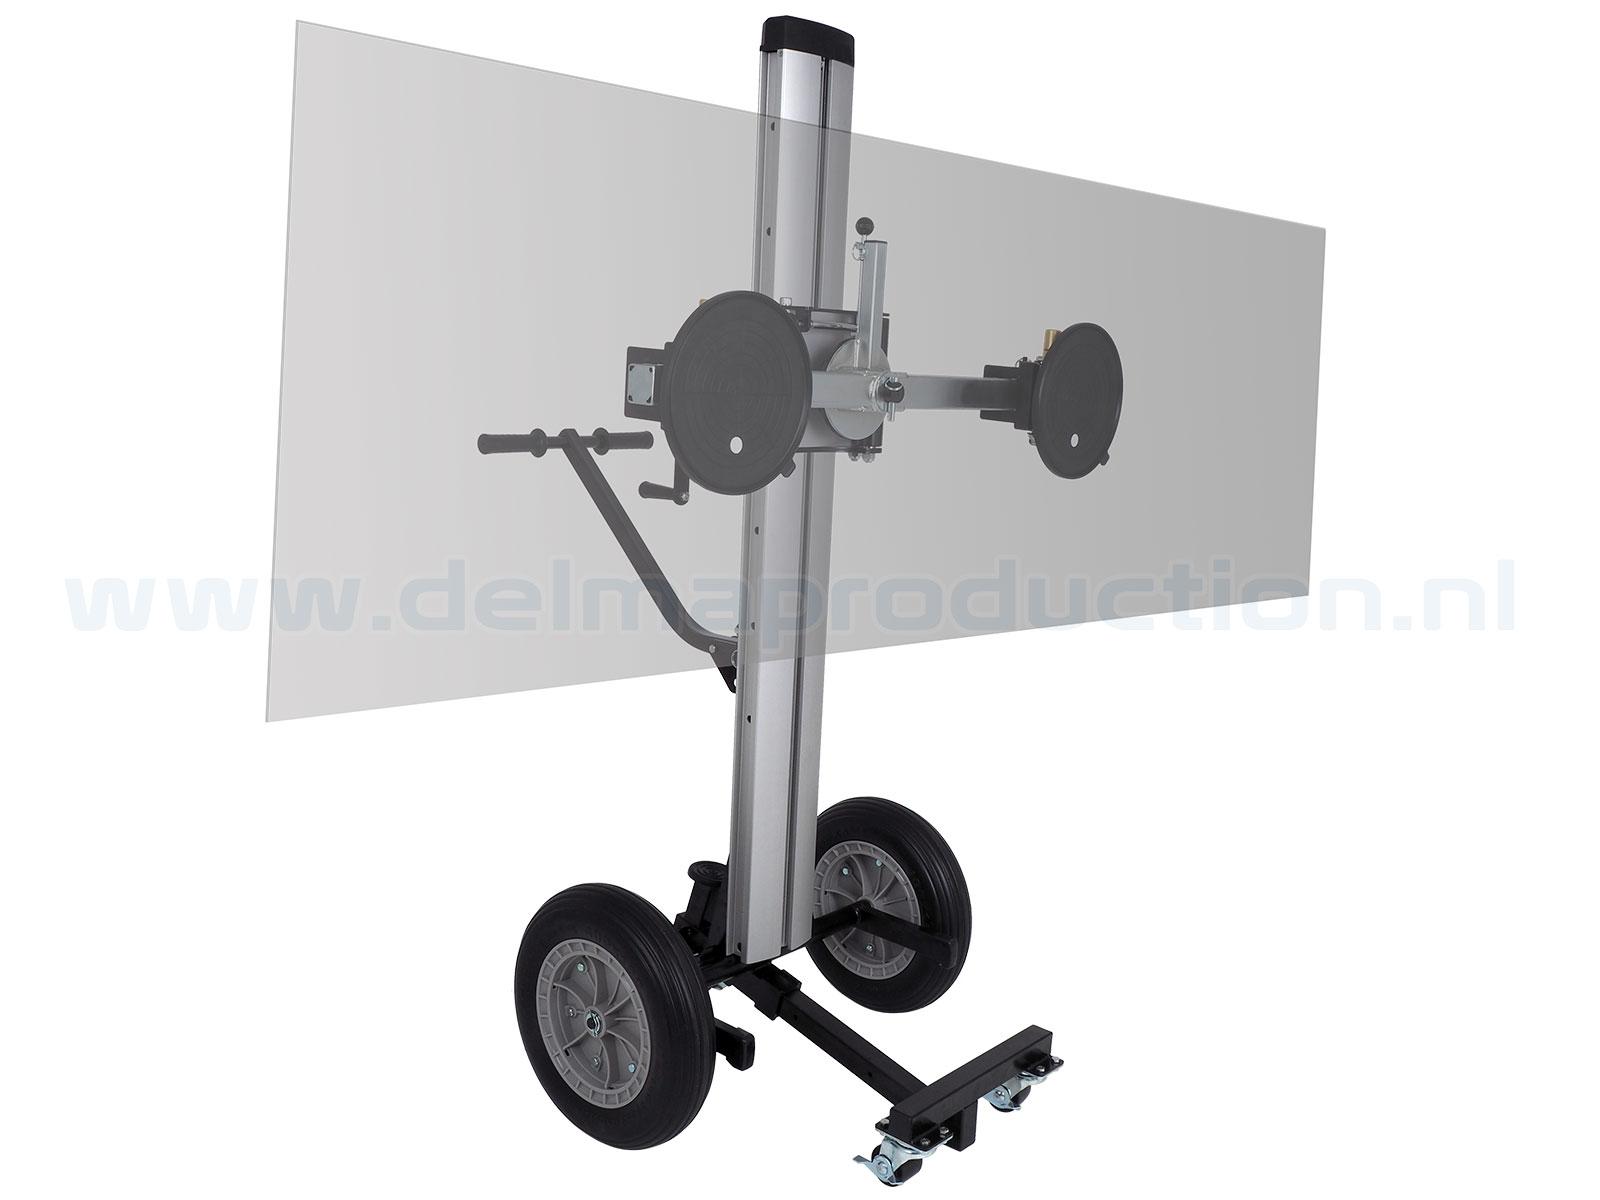 Glas transport- en montagelift Max. hoogte: 1,60 m Gewicht: 49 kg Wielen: 4 stuks (2 geremd) Vloeroppervlak: 1,4 x 1,4 m Draagvermogen: 180 kg (1)